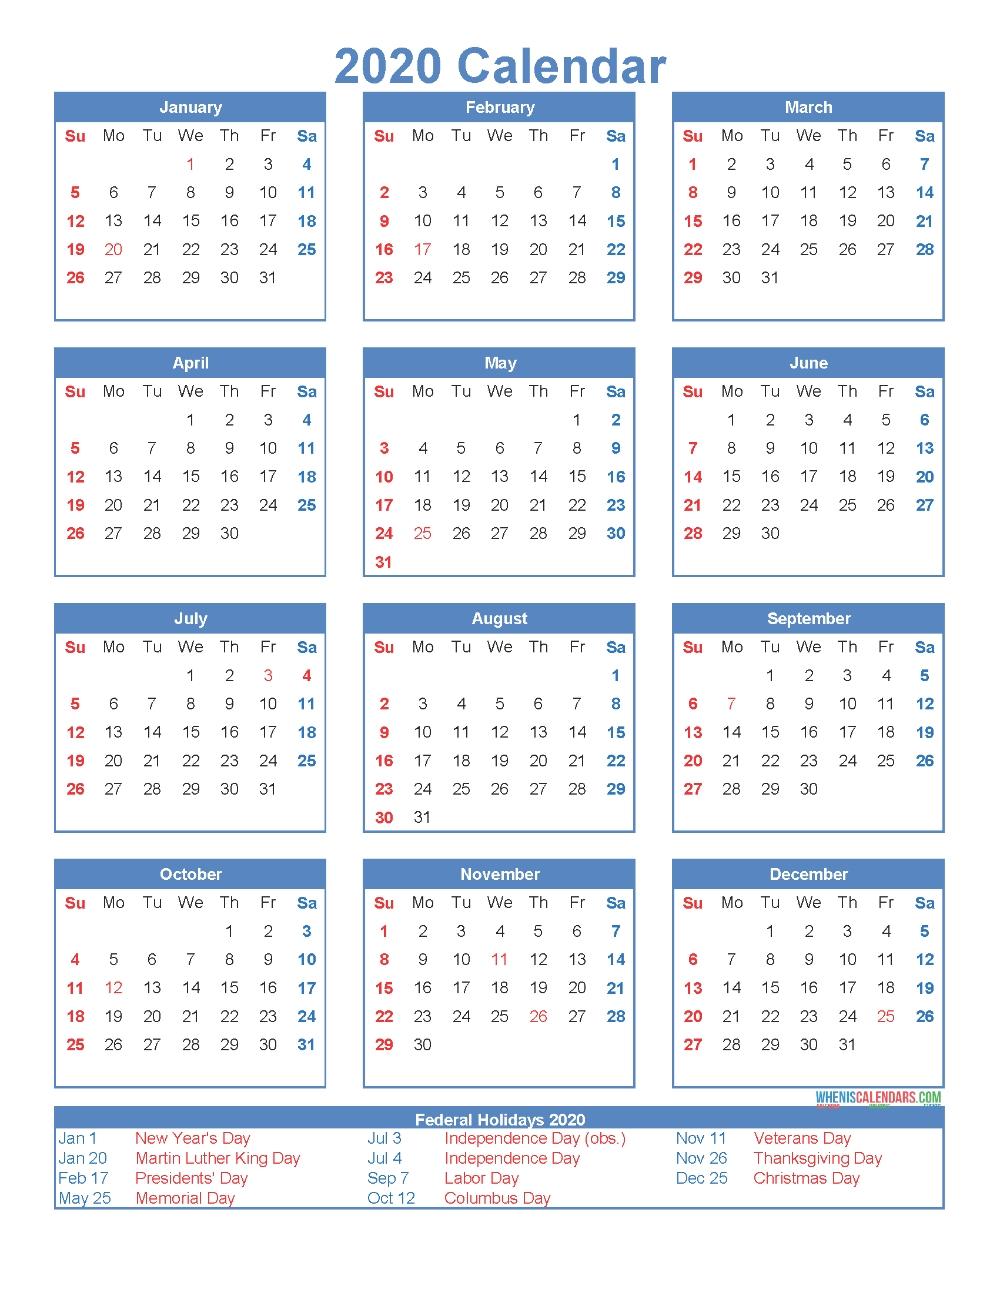 Depo-Provera Calendar 2020 - Template Calendar Design  Depo Calculator 2021